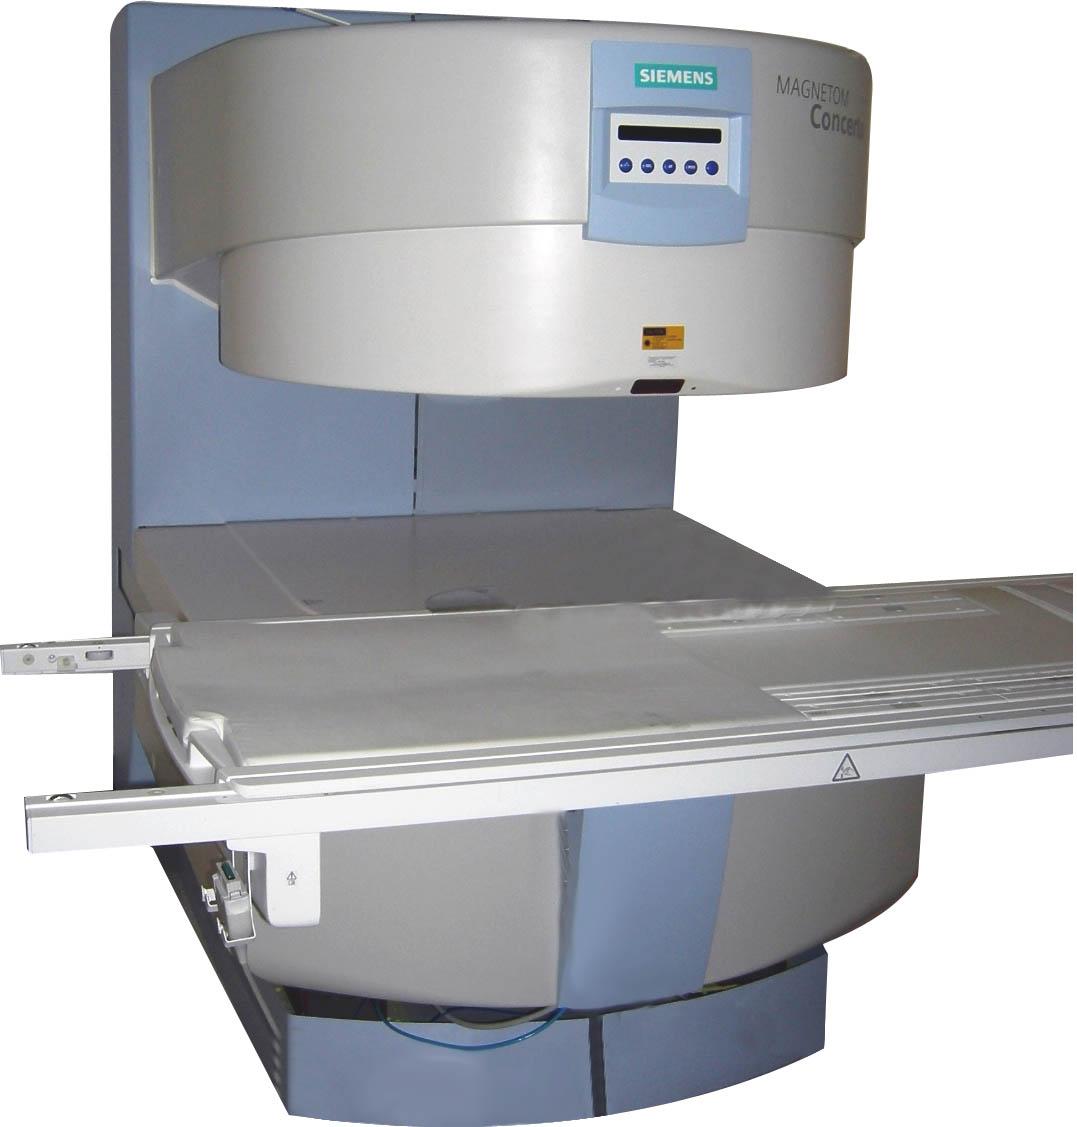 Siemens_0_2T_Concerto_Open_MRI_Scanner